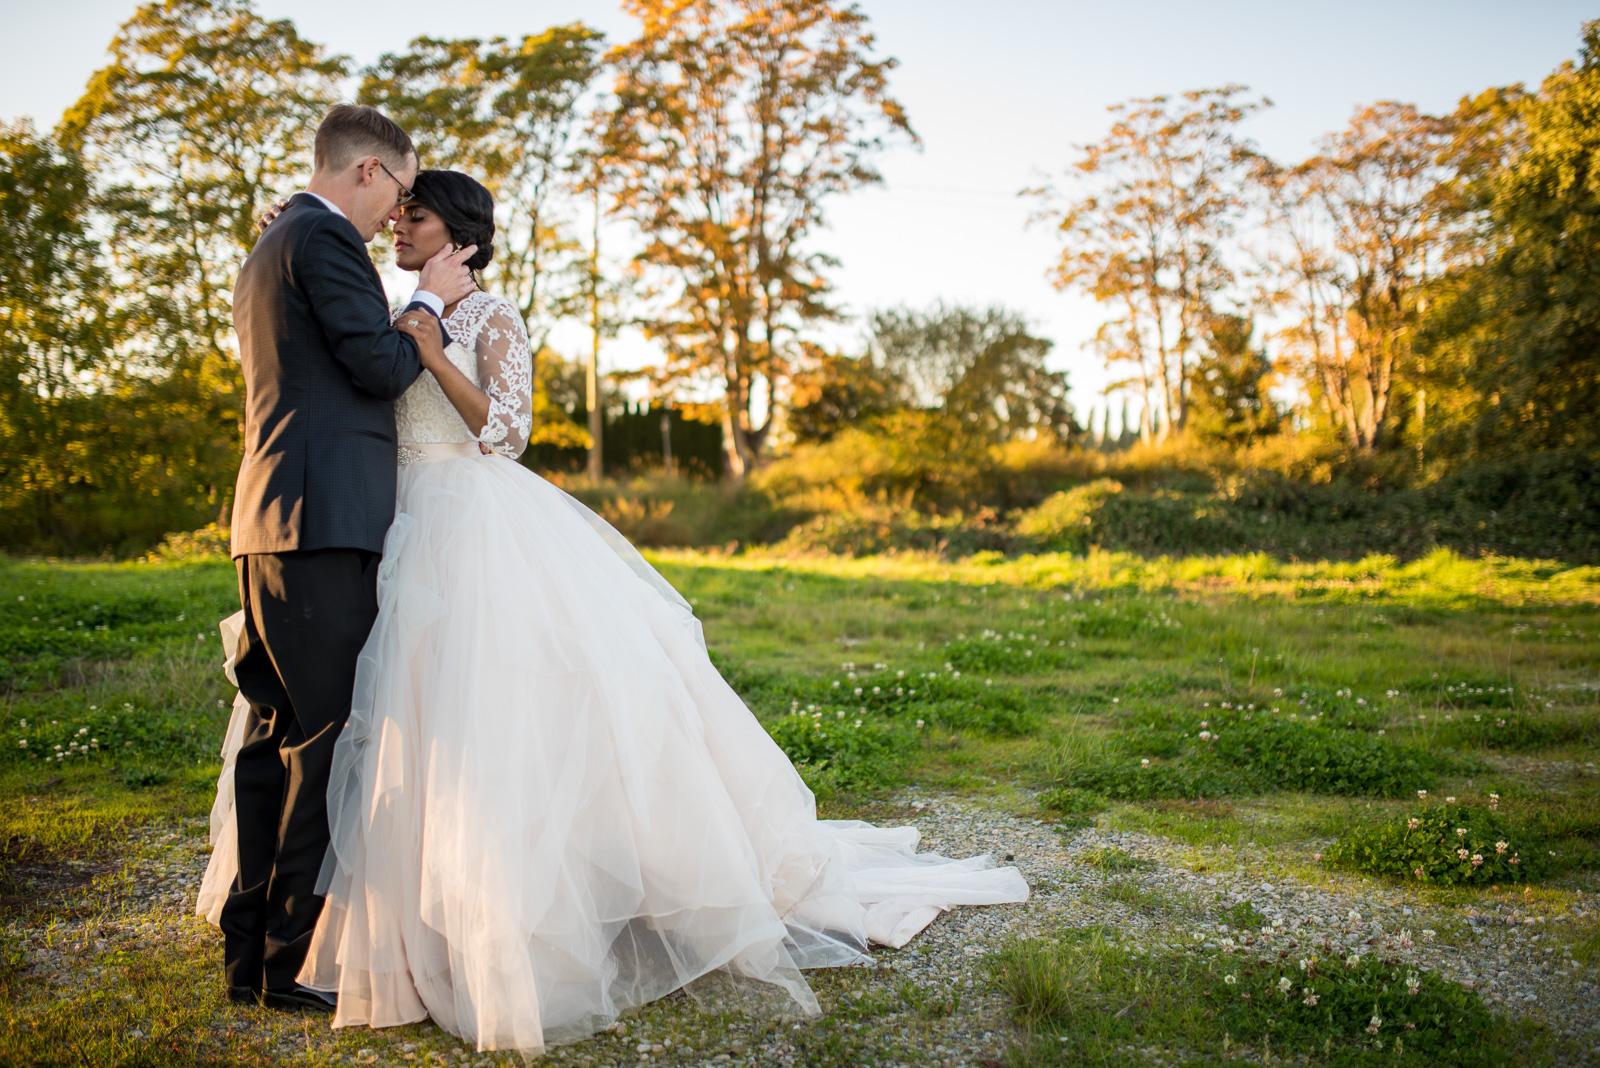 bc-wedding-photographers-paradise-banquet-hall-wedding-29.jpg